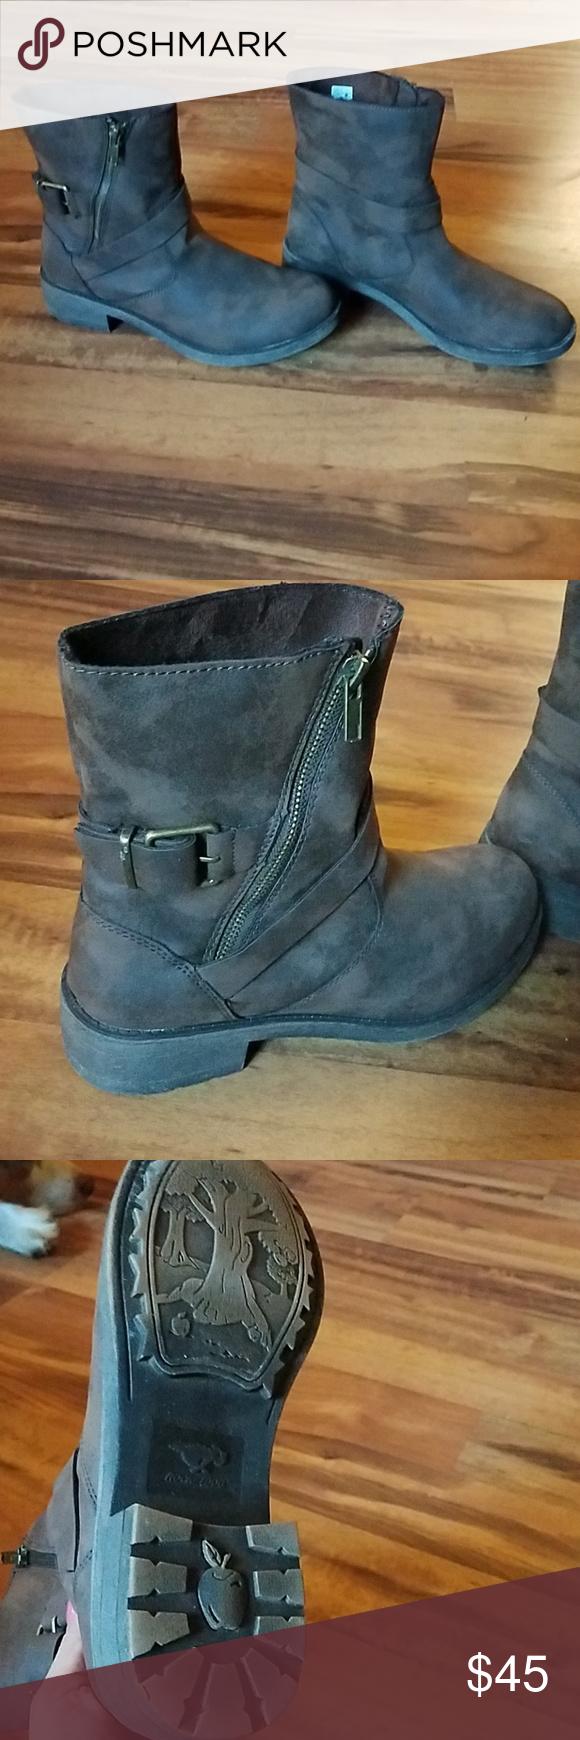 4ae1e538806 Zip up rocket dog boots Dark brown Zip up rocket dog boots. Barely ...